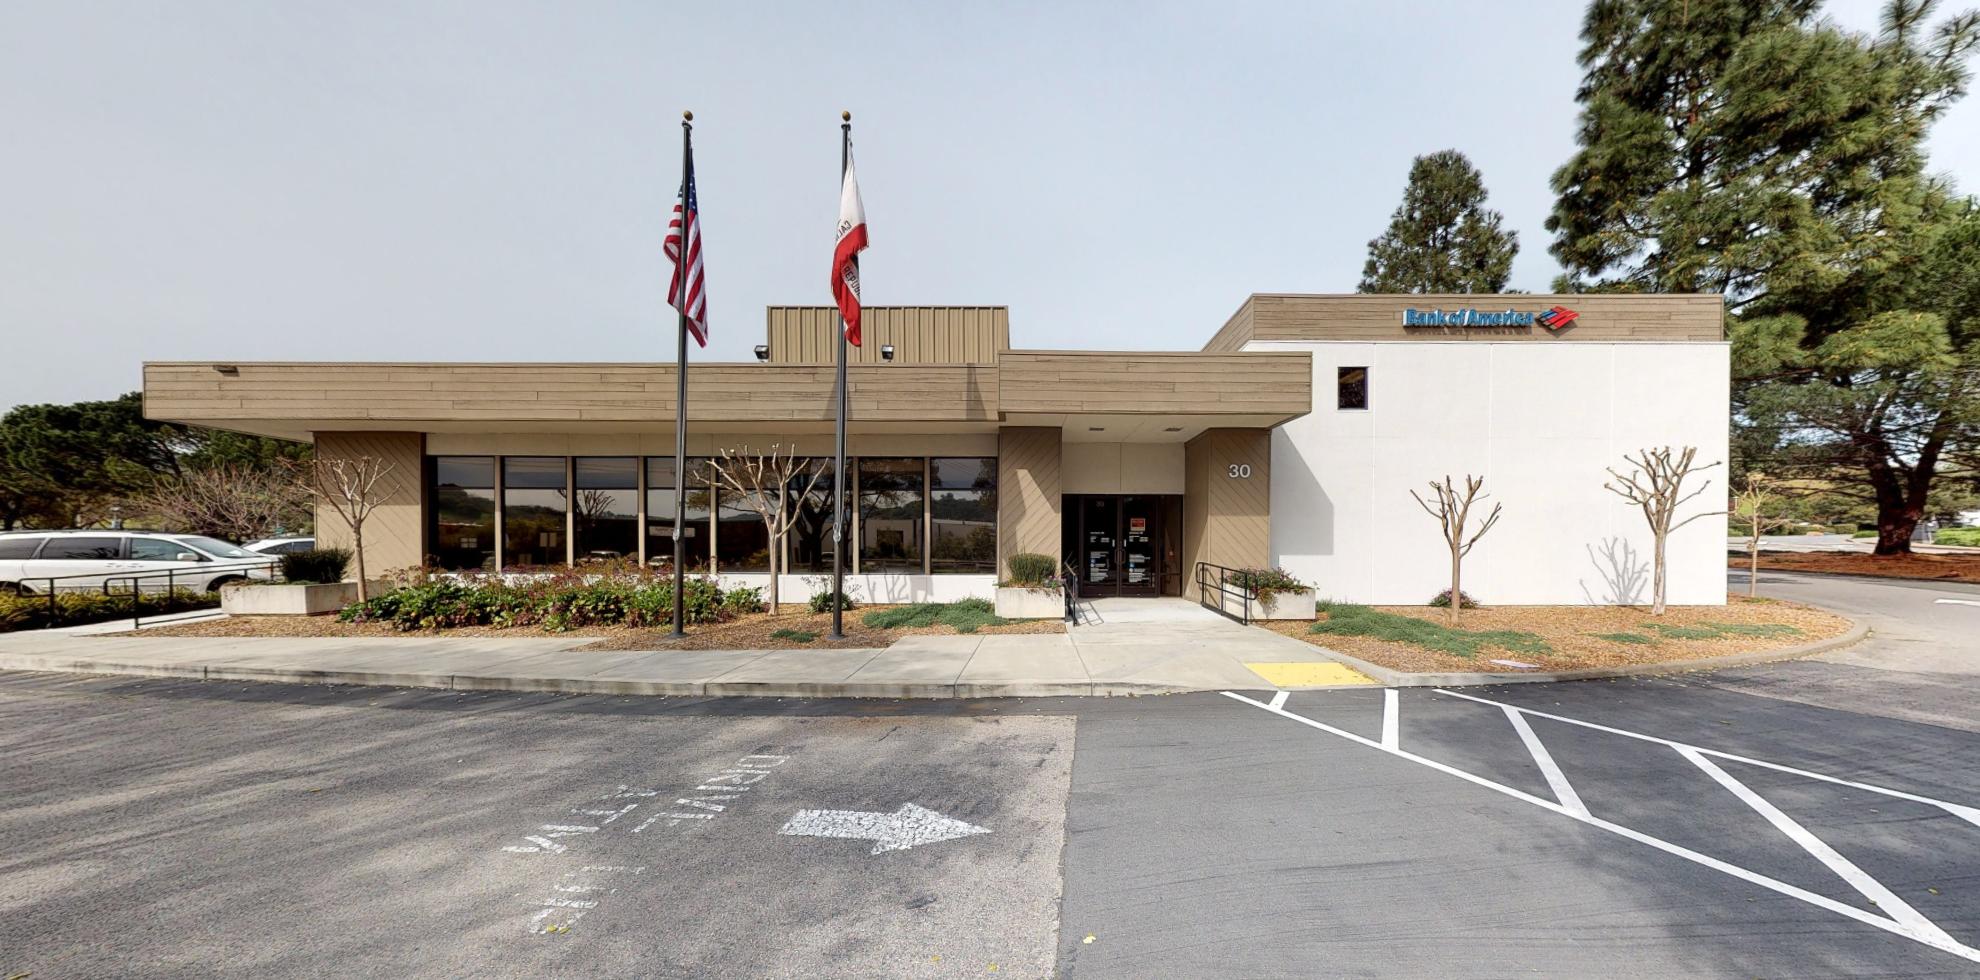 Bank of America financial center with drive-thru ATM   30 Smith Ranch Rd, San Rafael, CA 94903